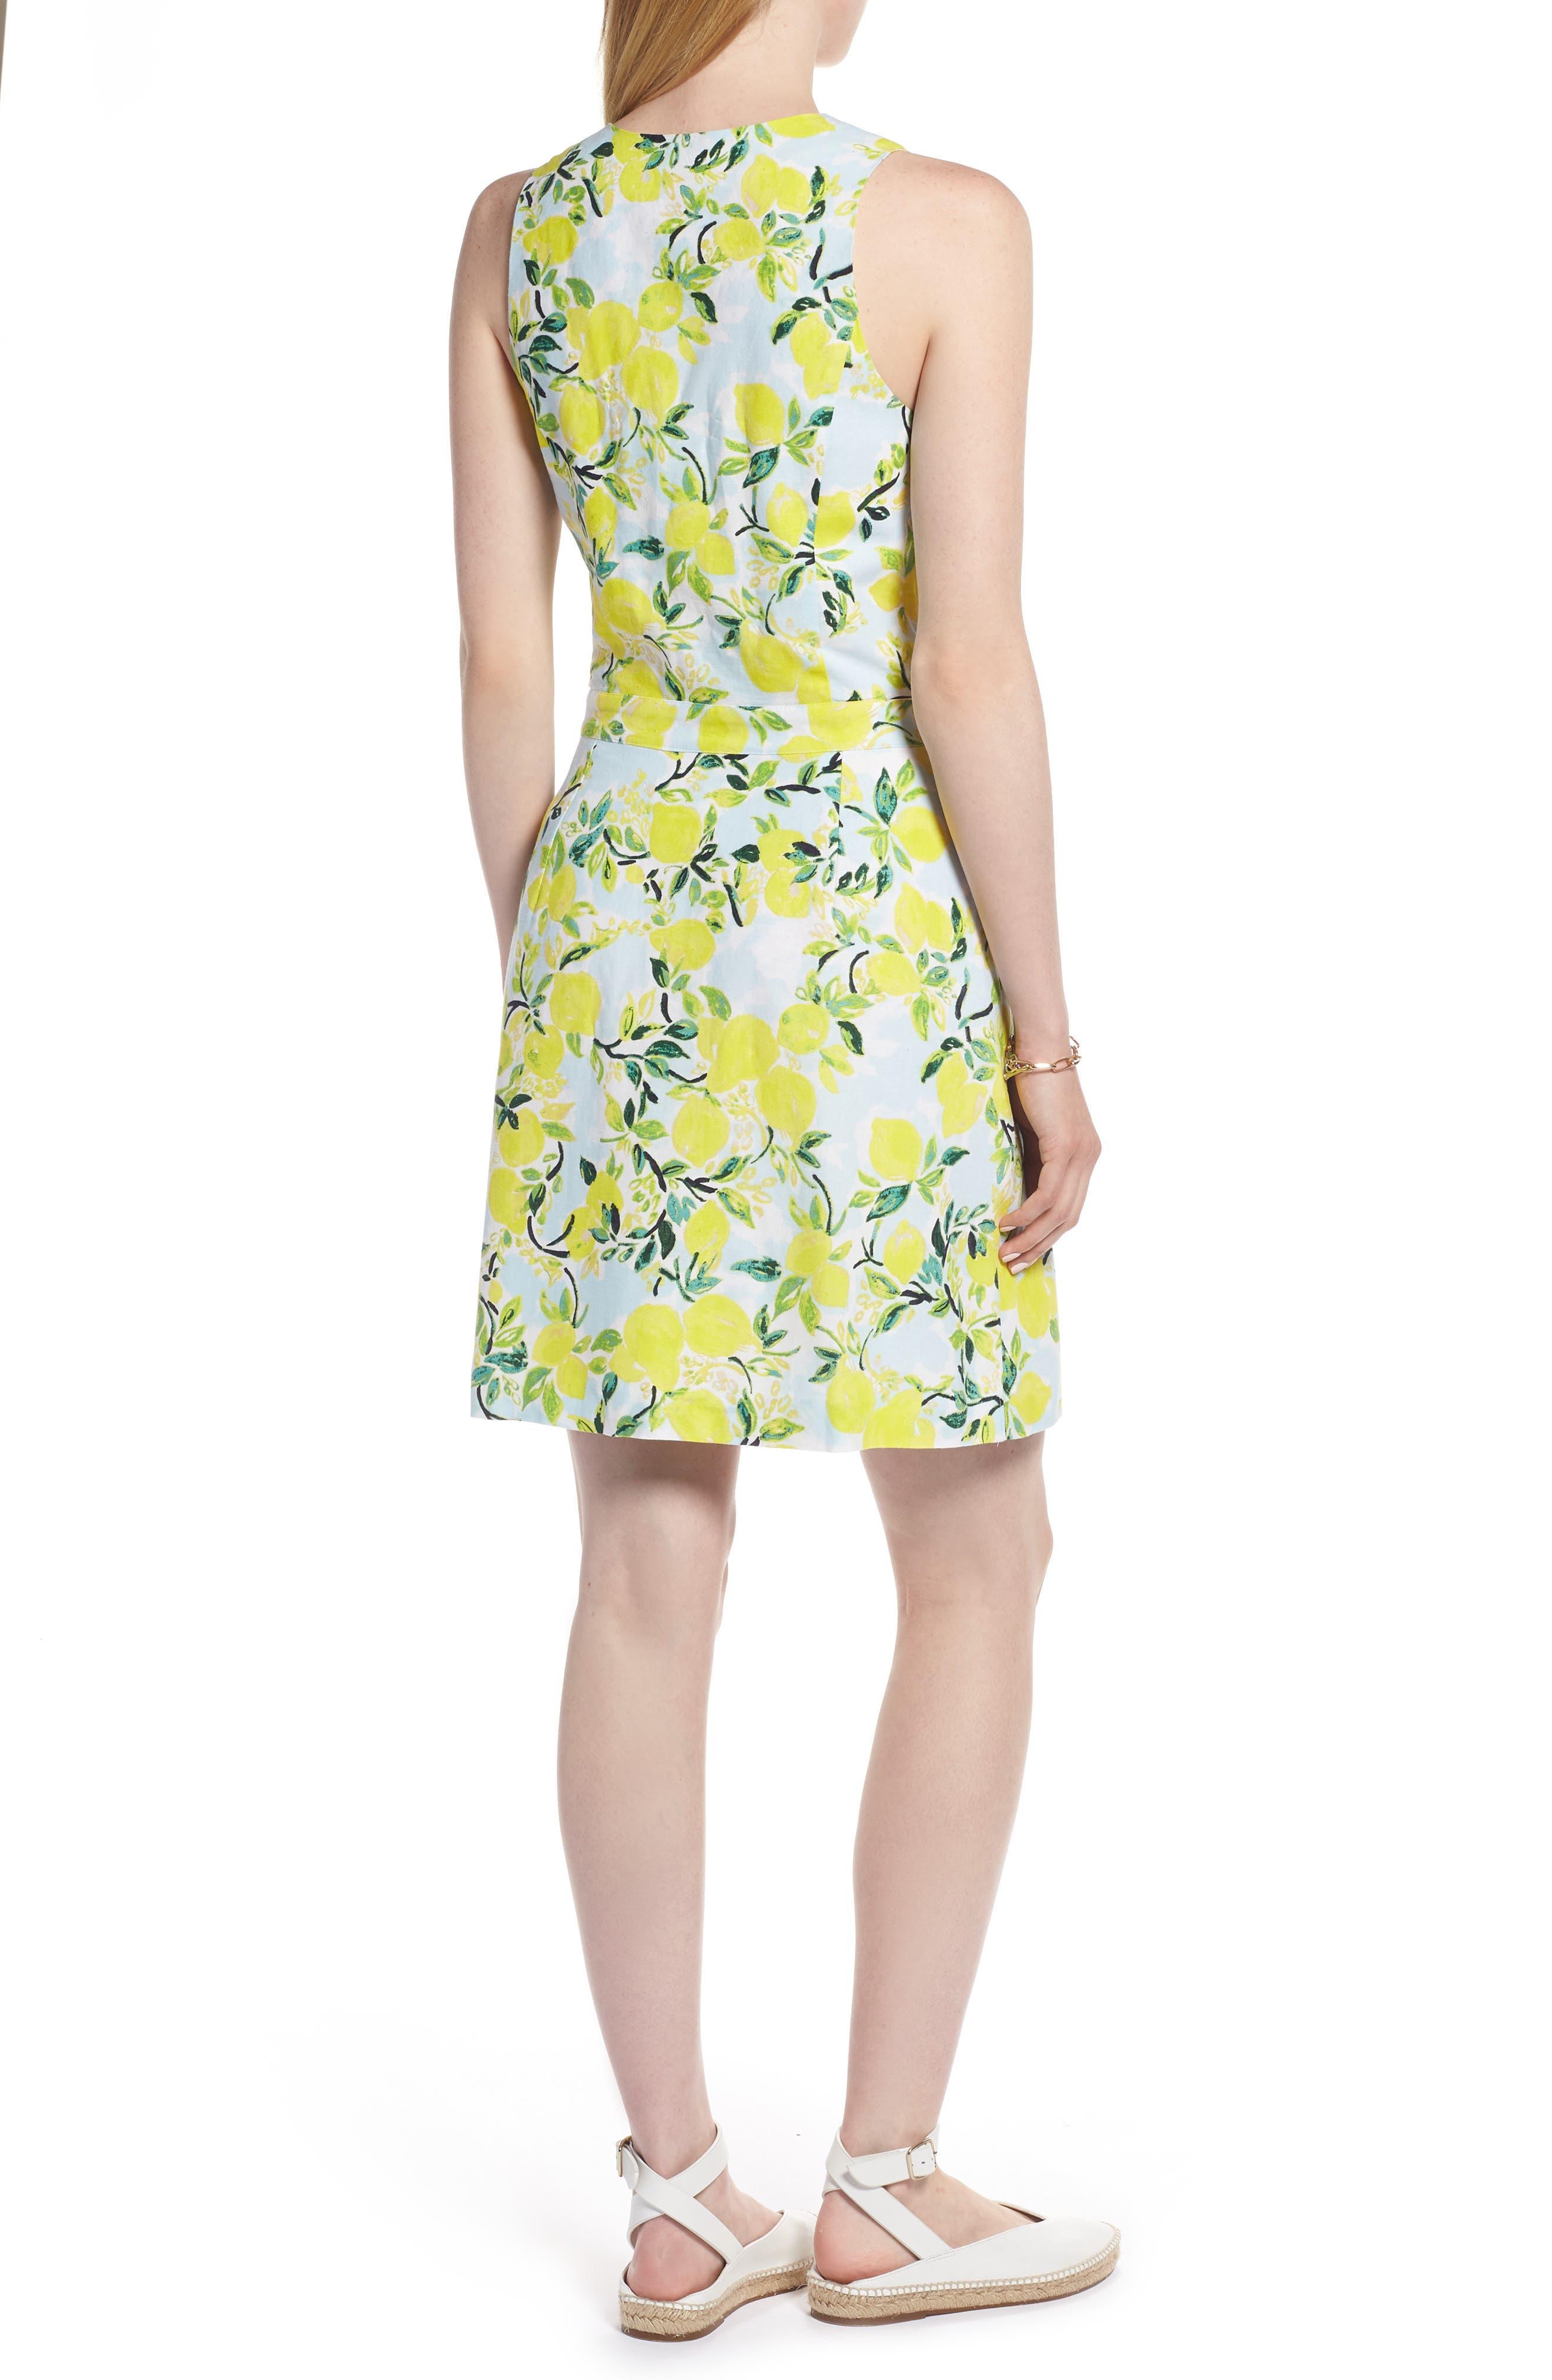 Tie Front Lemon Print Mini Dress,                             Alternate thumbnail 2, color,                             Blue- Yellow Citrus Print